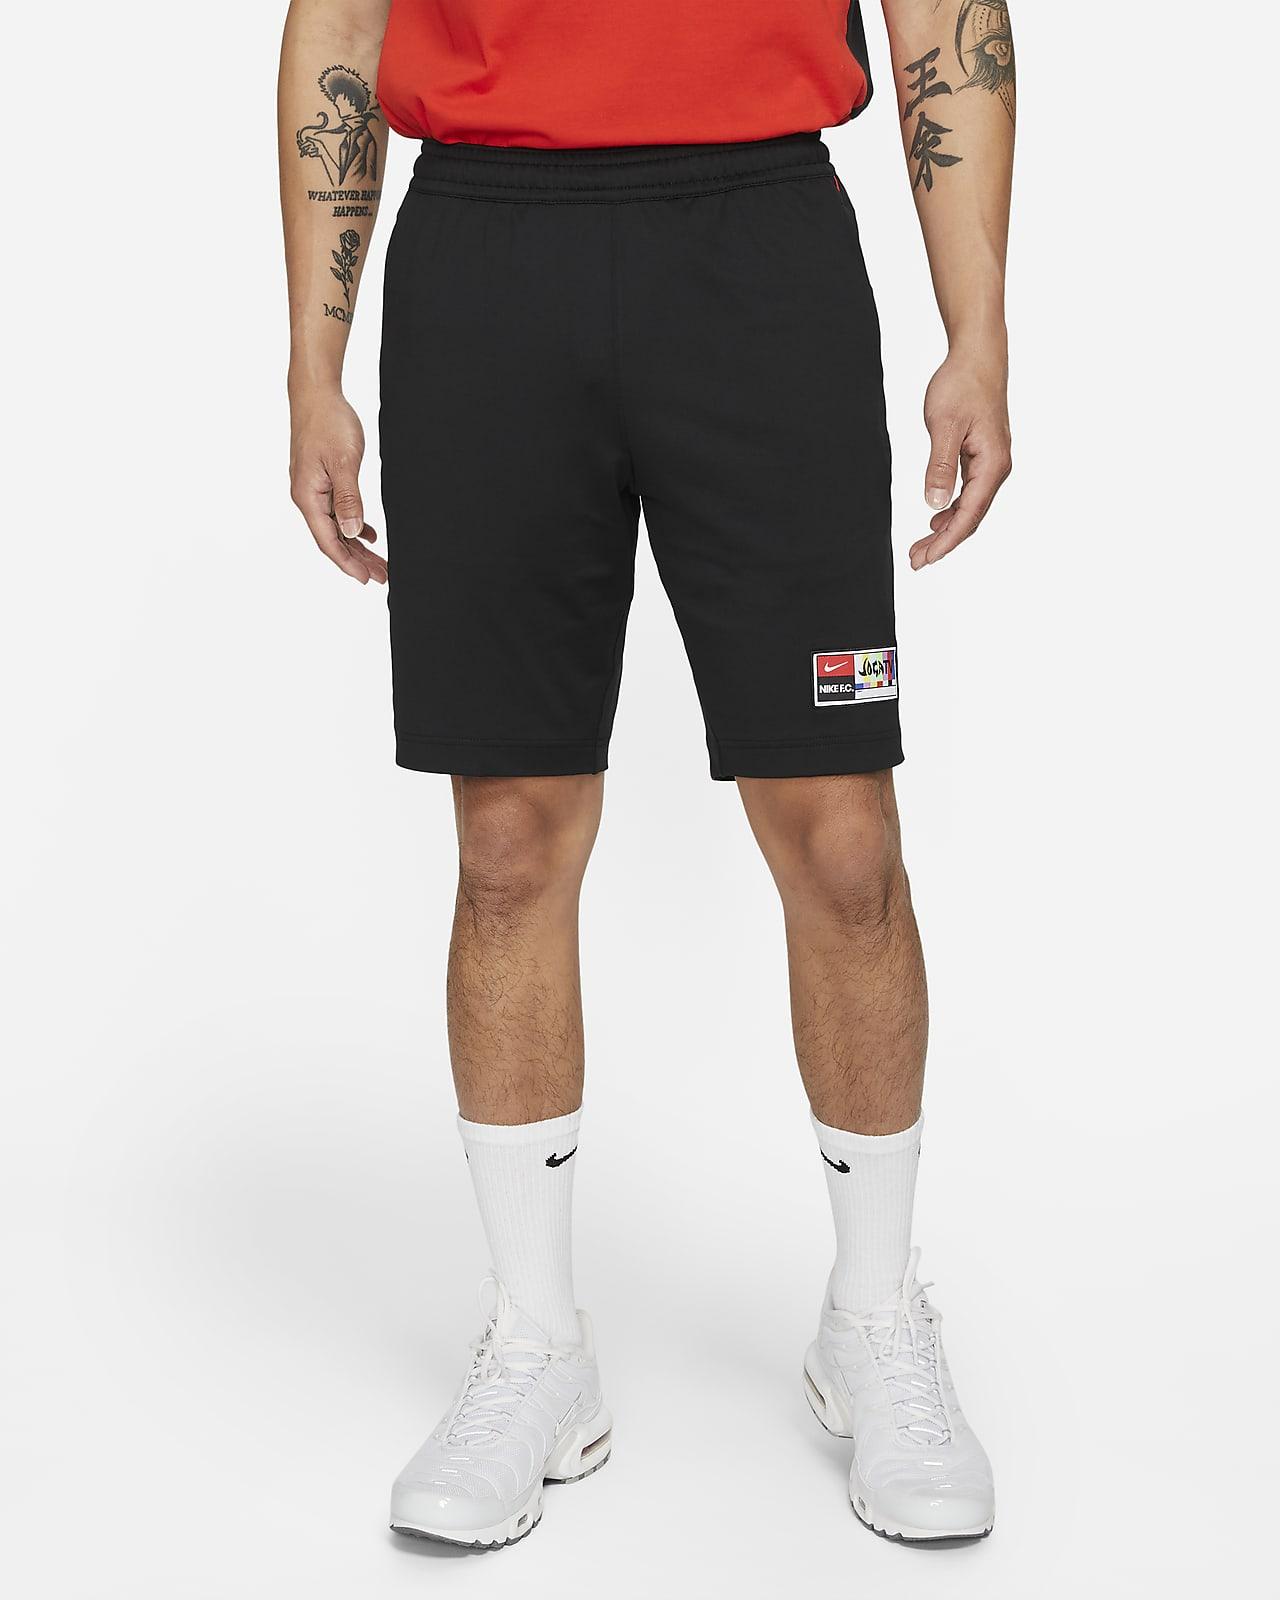 Nike F.C. Dri-FIT Men's Knit Soccer Shorts